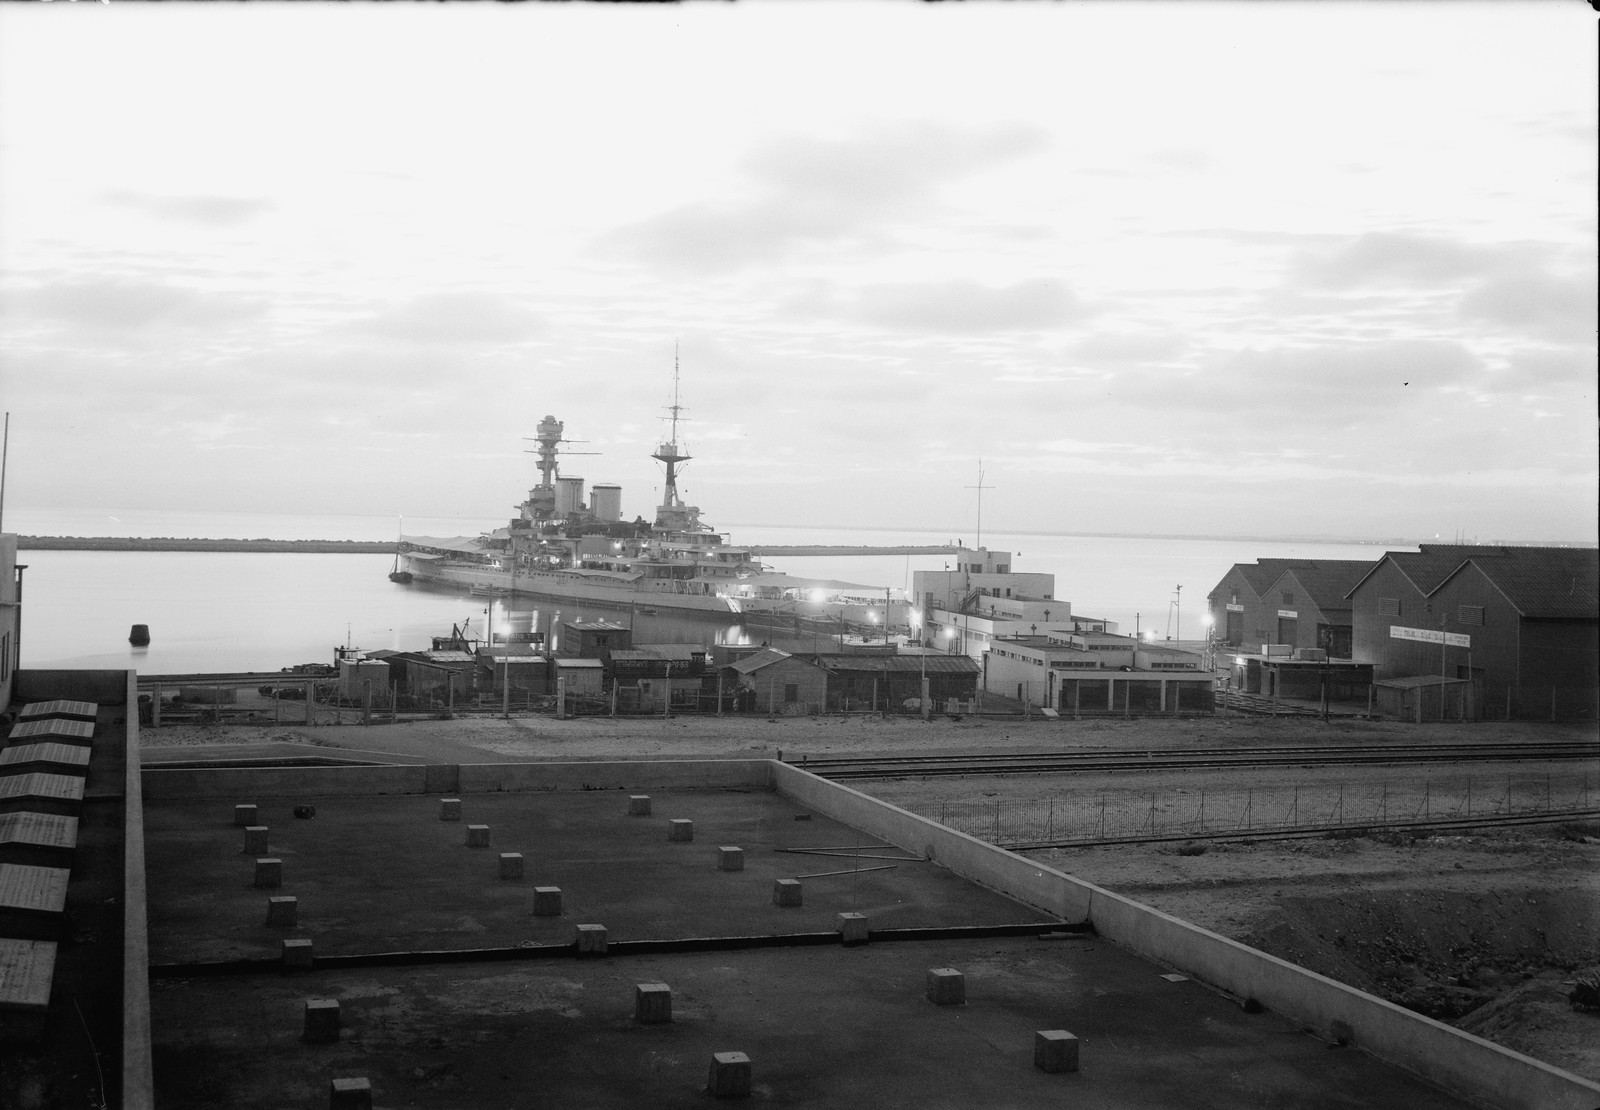 Хайфа. Крейсер HMS Repulse в гавани